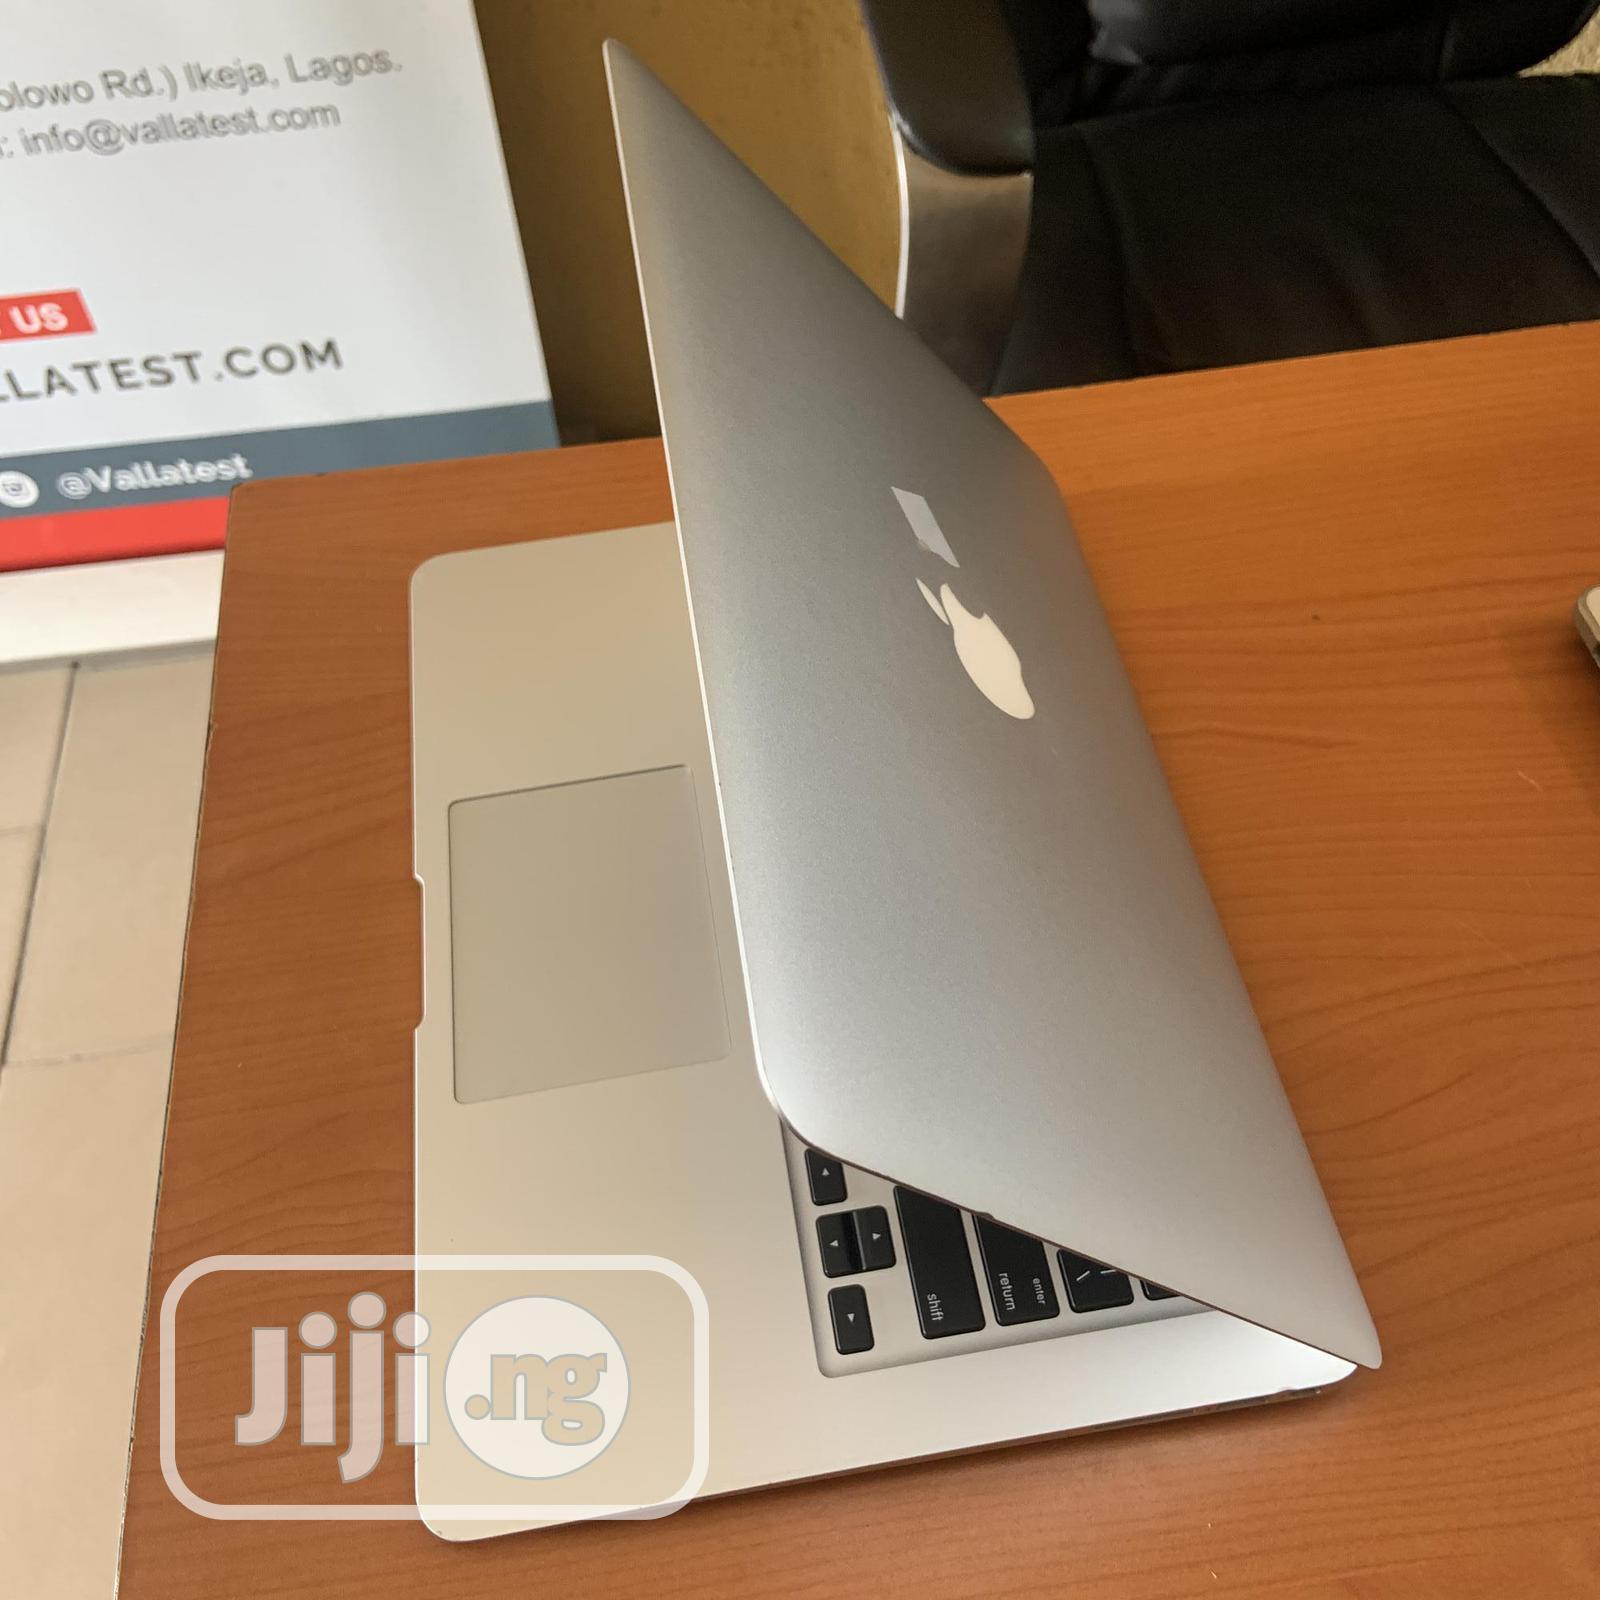 Laptop Apple MacBook Air 2015 8GB Intel Core I7 SSD 256GB | Laptops & Computers for sale in Ikeja, Lagos State, Nigeria